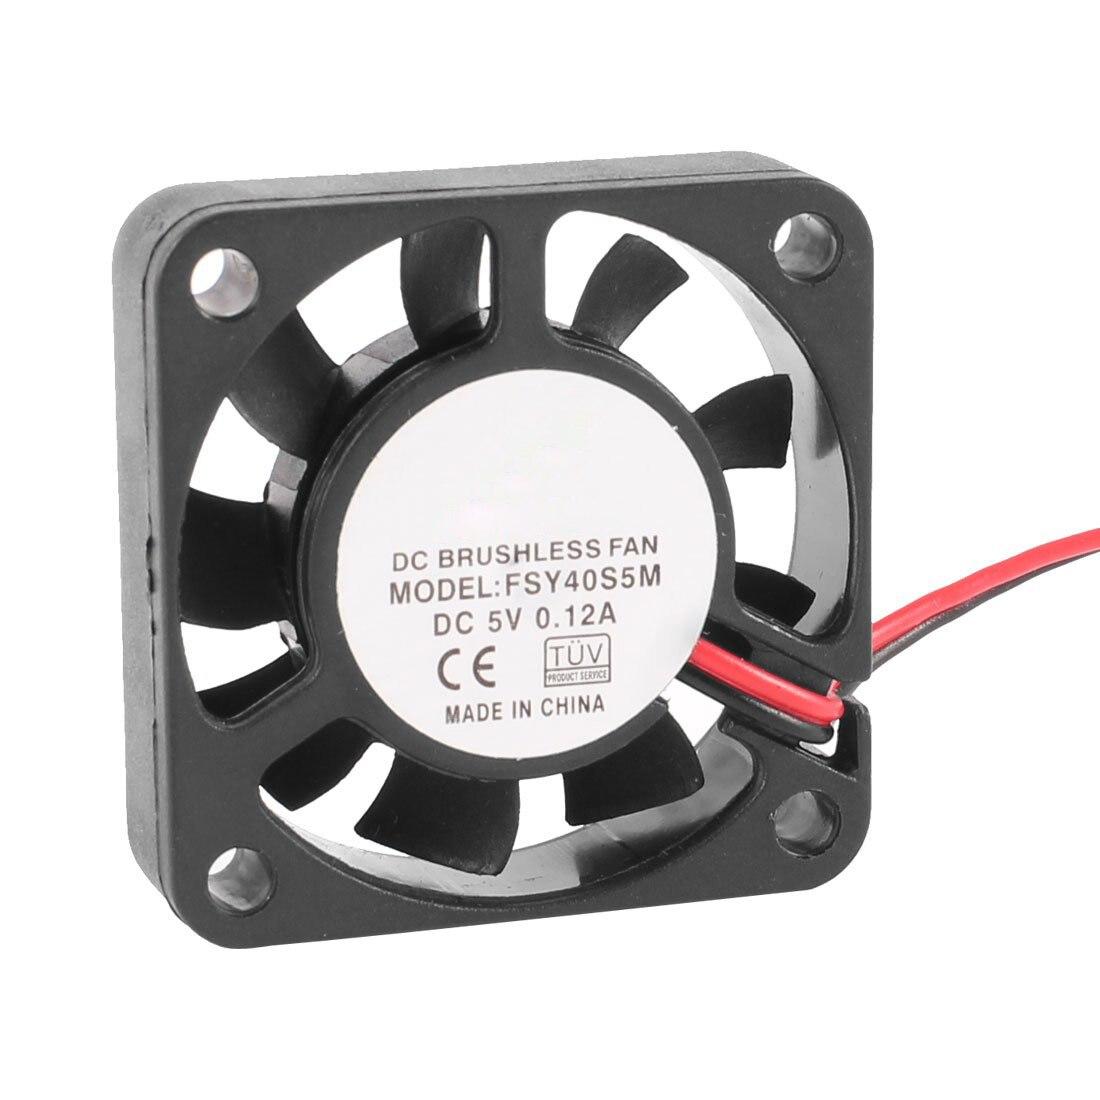 GTFS-40mm x 10mm 0.12A 2Pin 5V DC Brushless Sleeve Bearing Cooling Fan